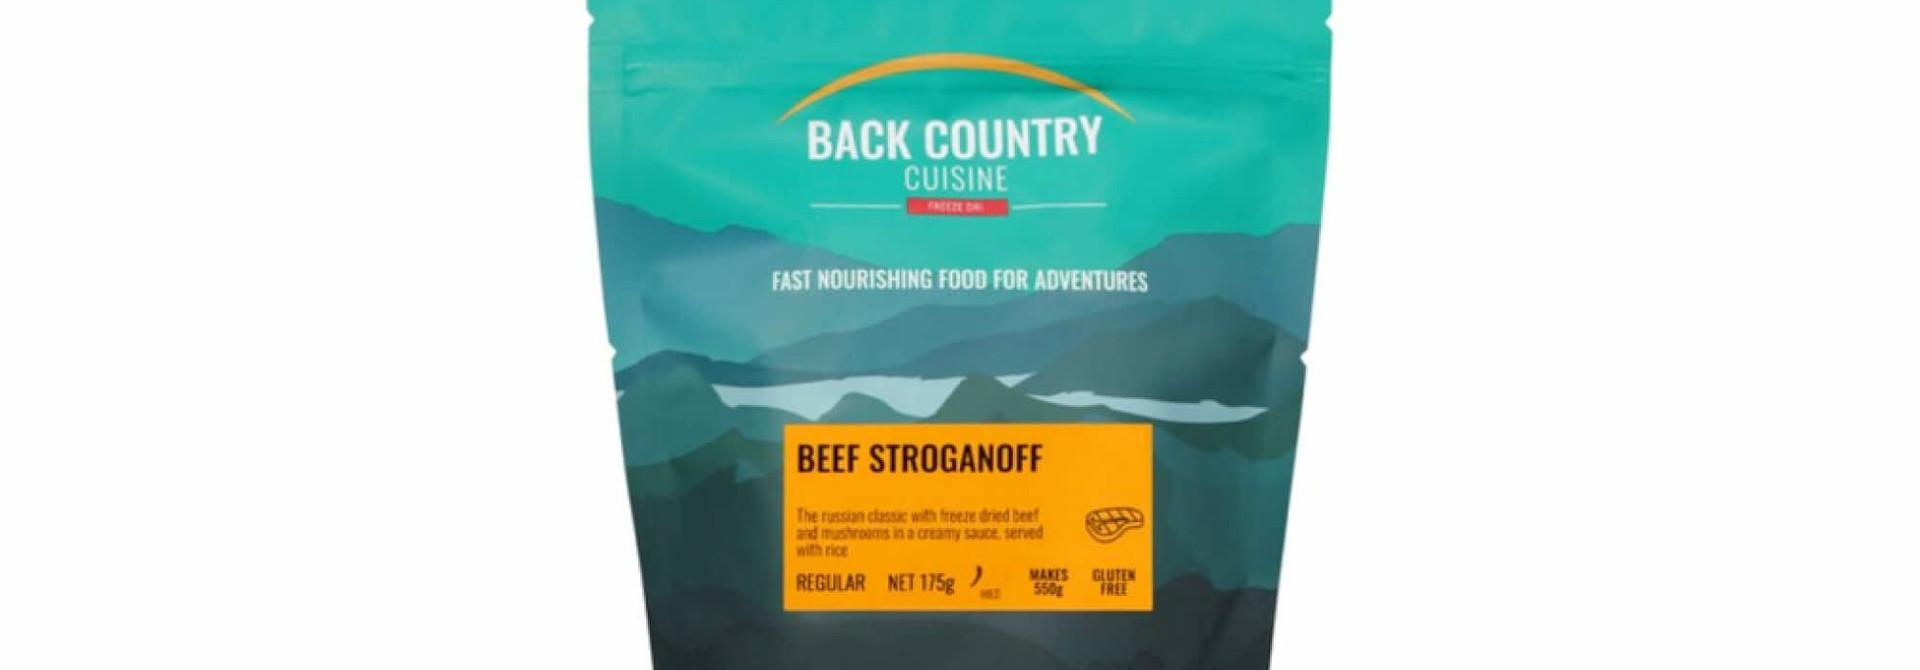 Beef Stroganoff Double